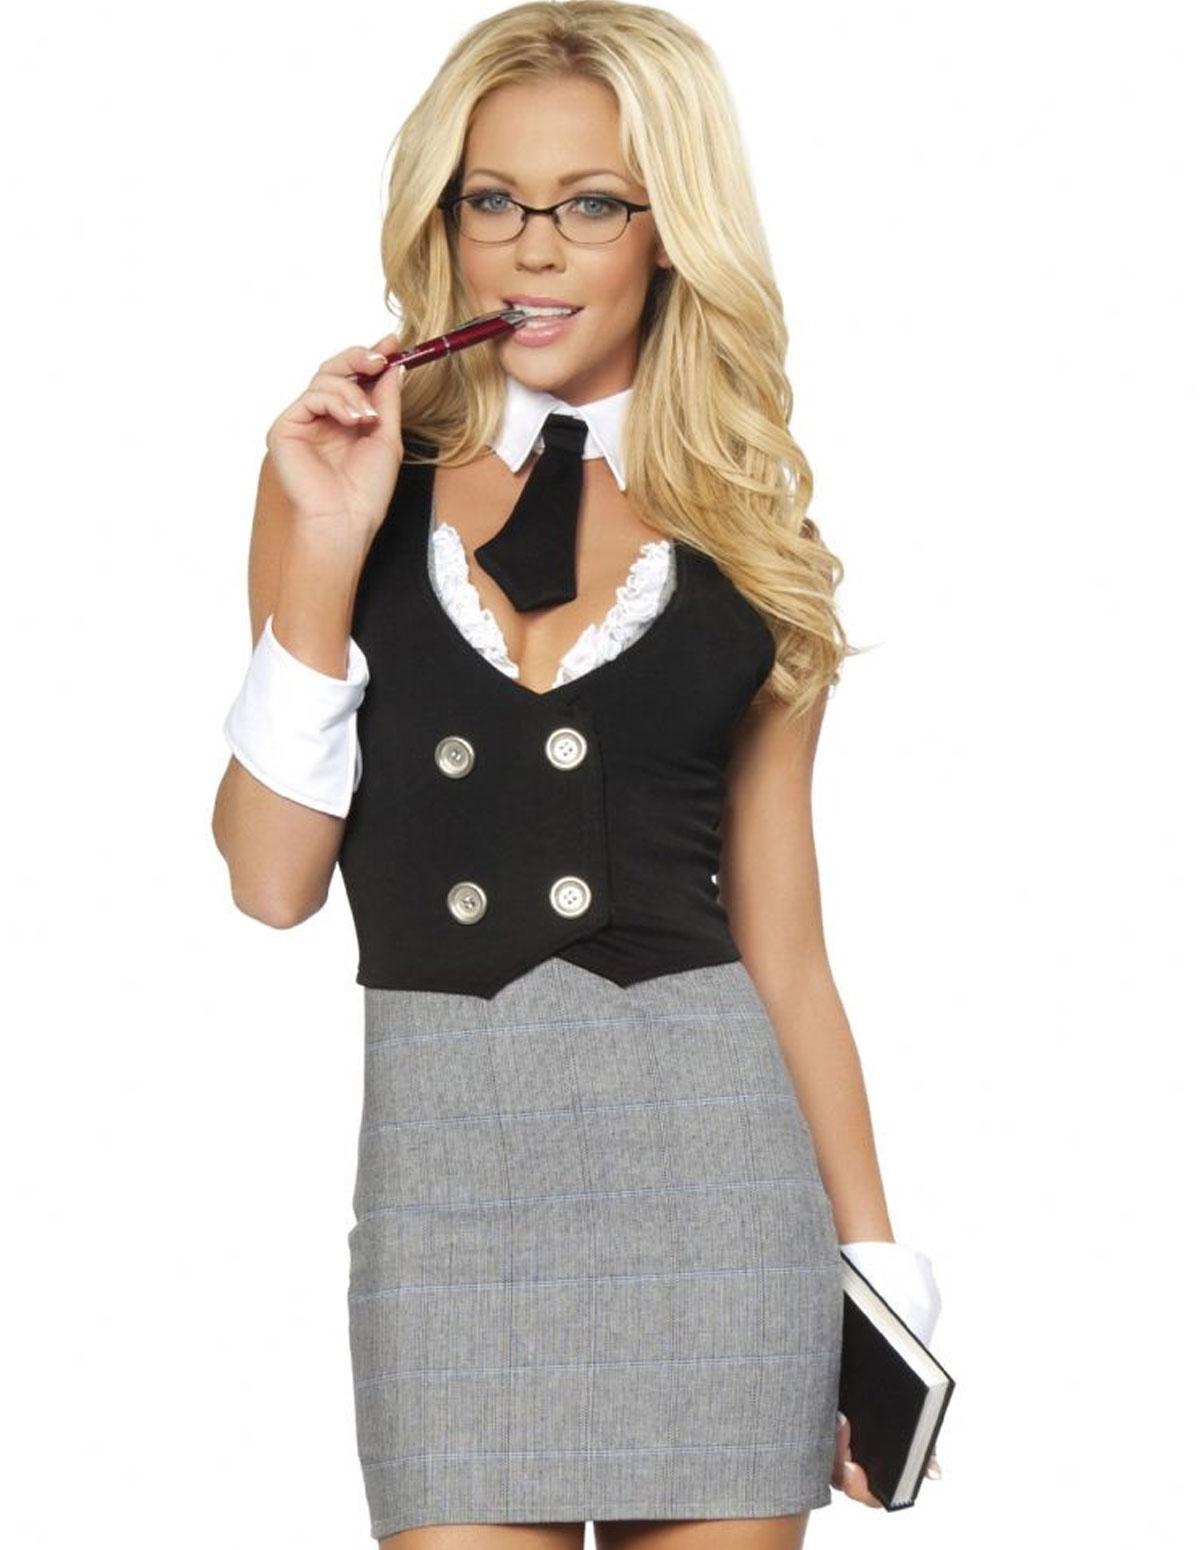 4Pc Librarian Costume